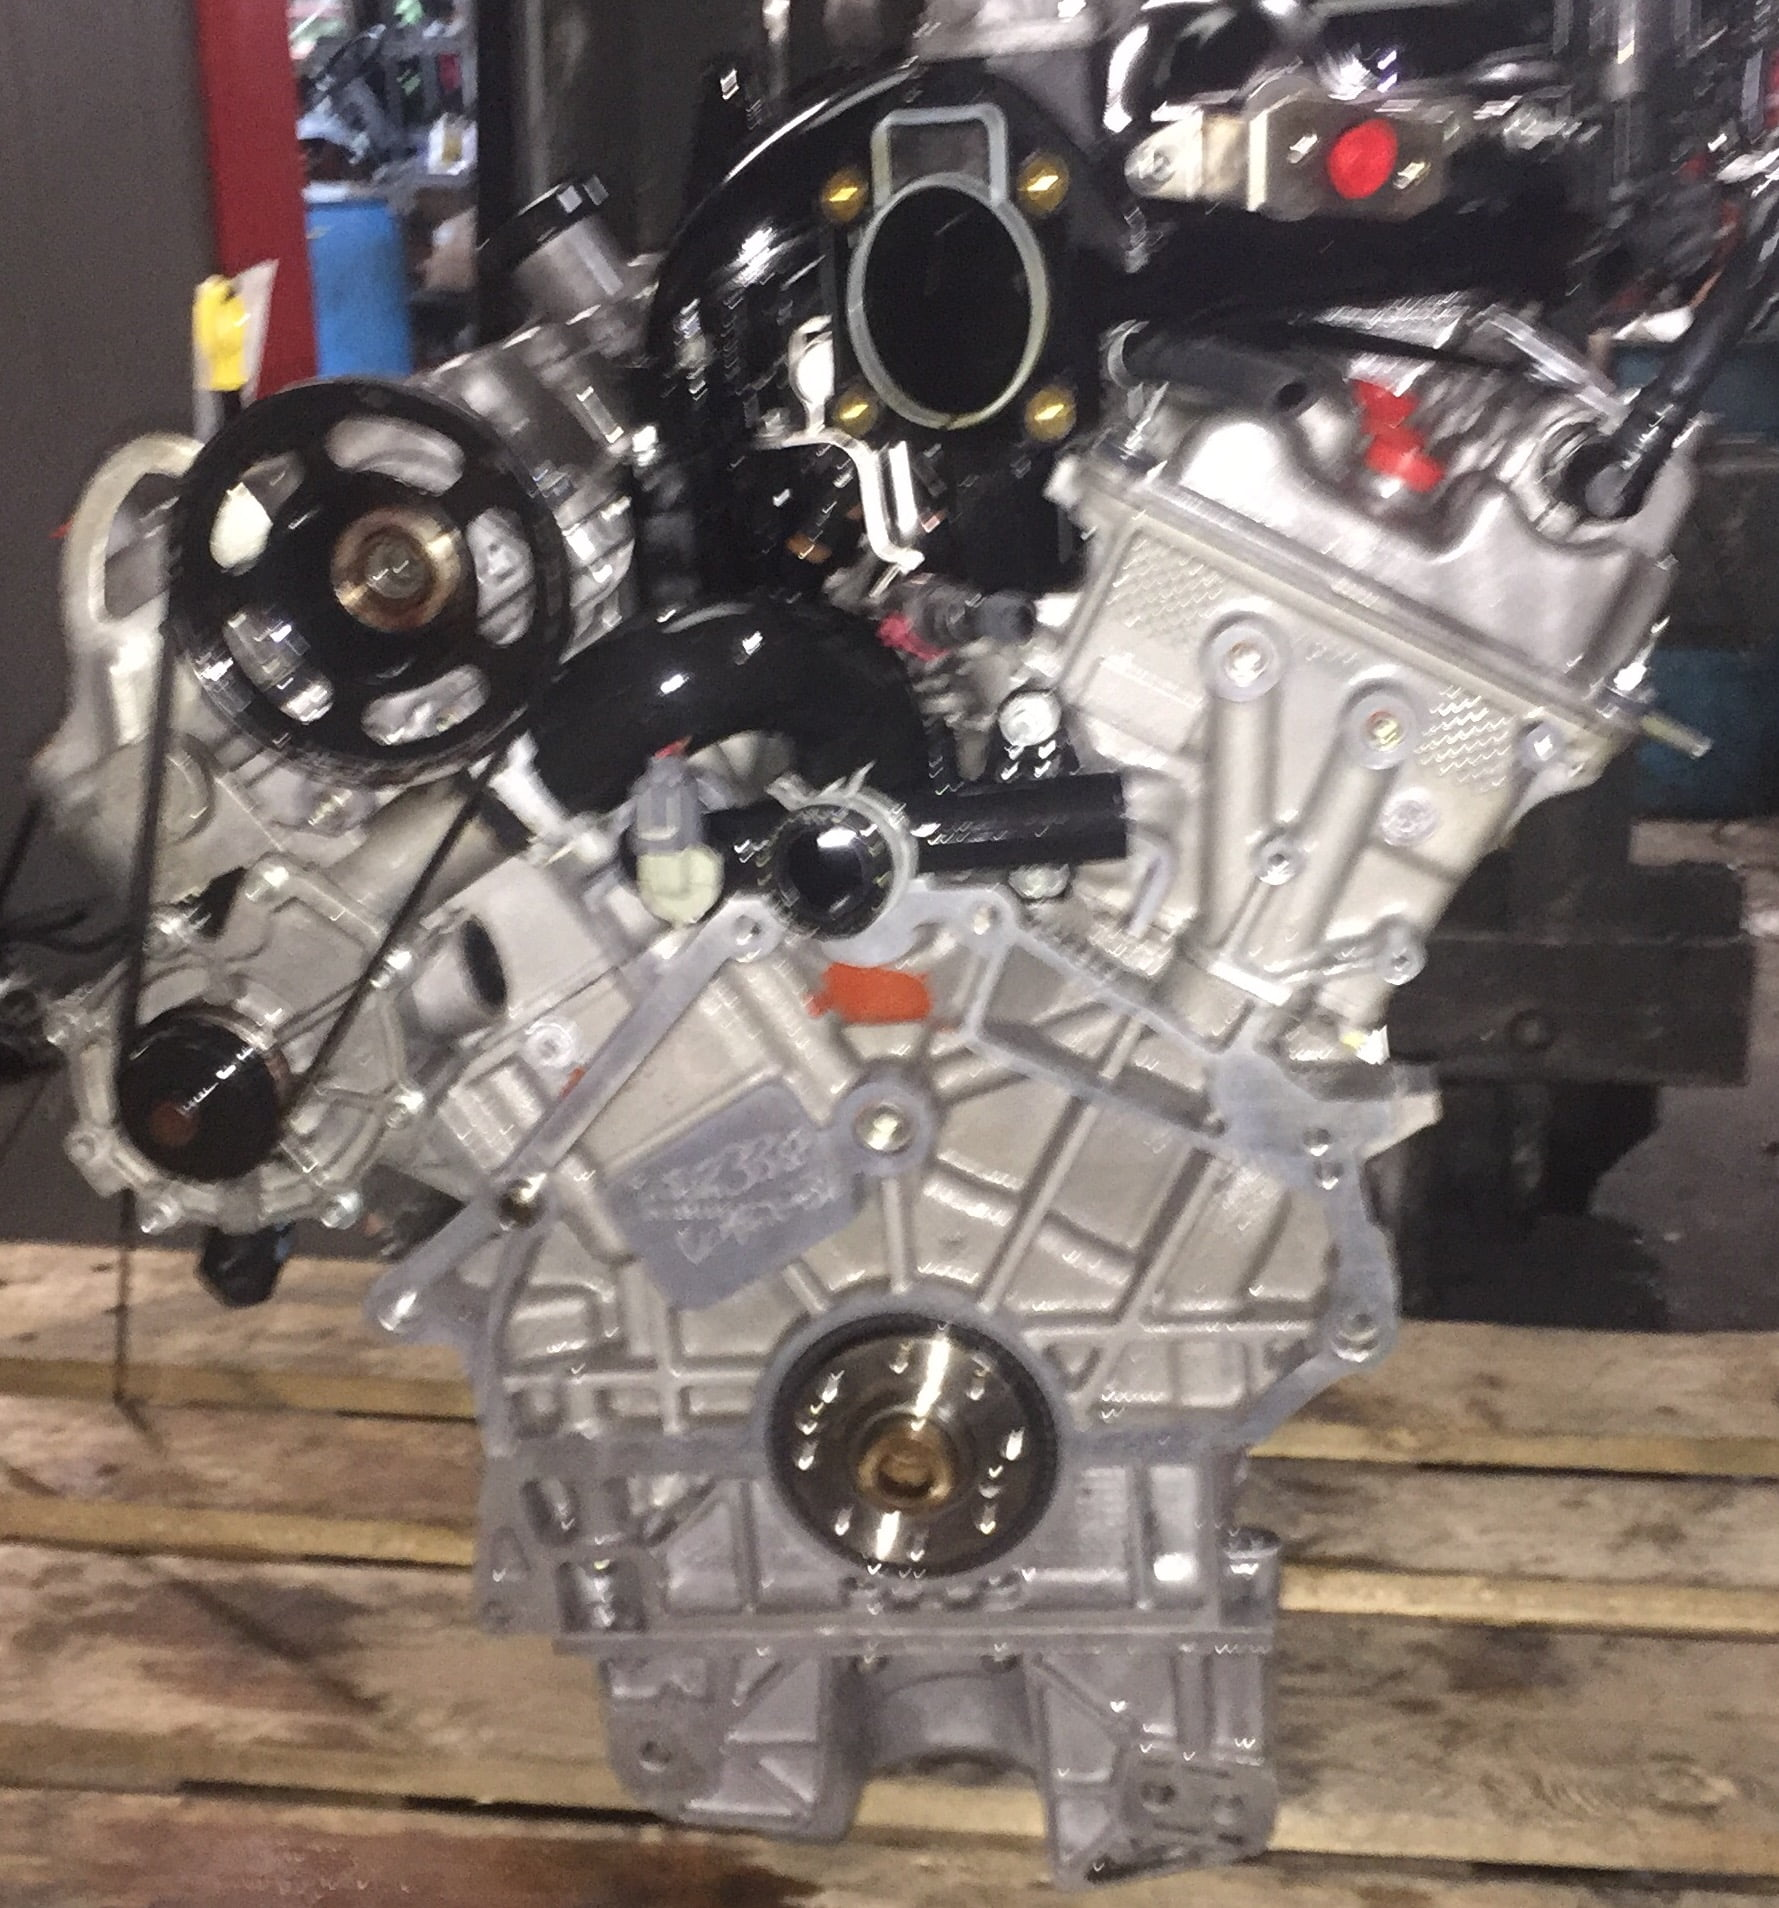 2008 Cadillac Escalade Ext Camshaft: Ford Escape Mazda Tribute Engine 3.0L 2005 – 2006